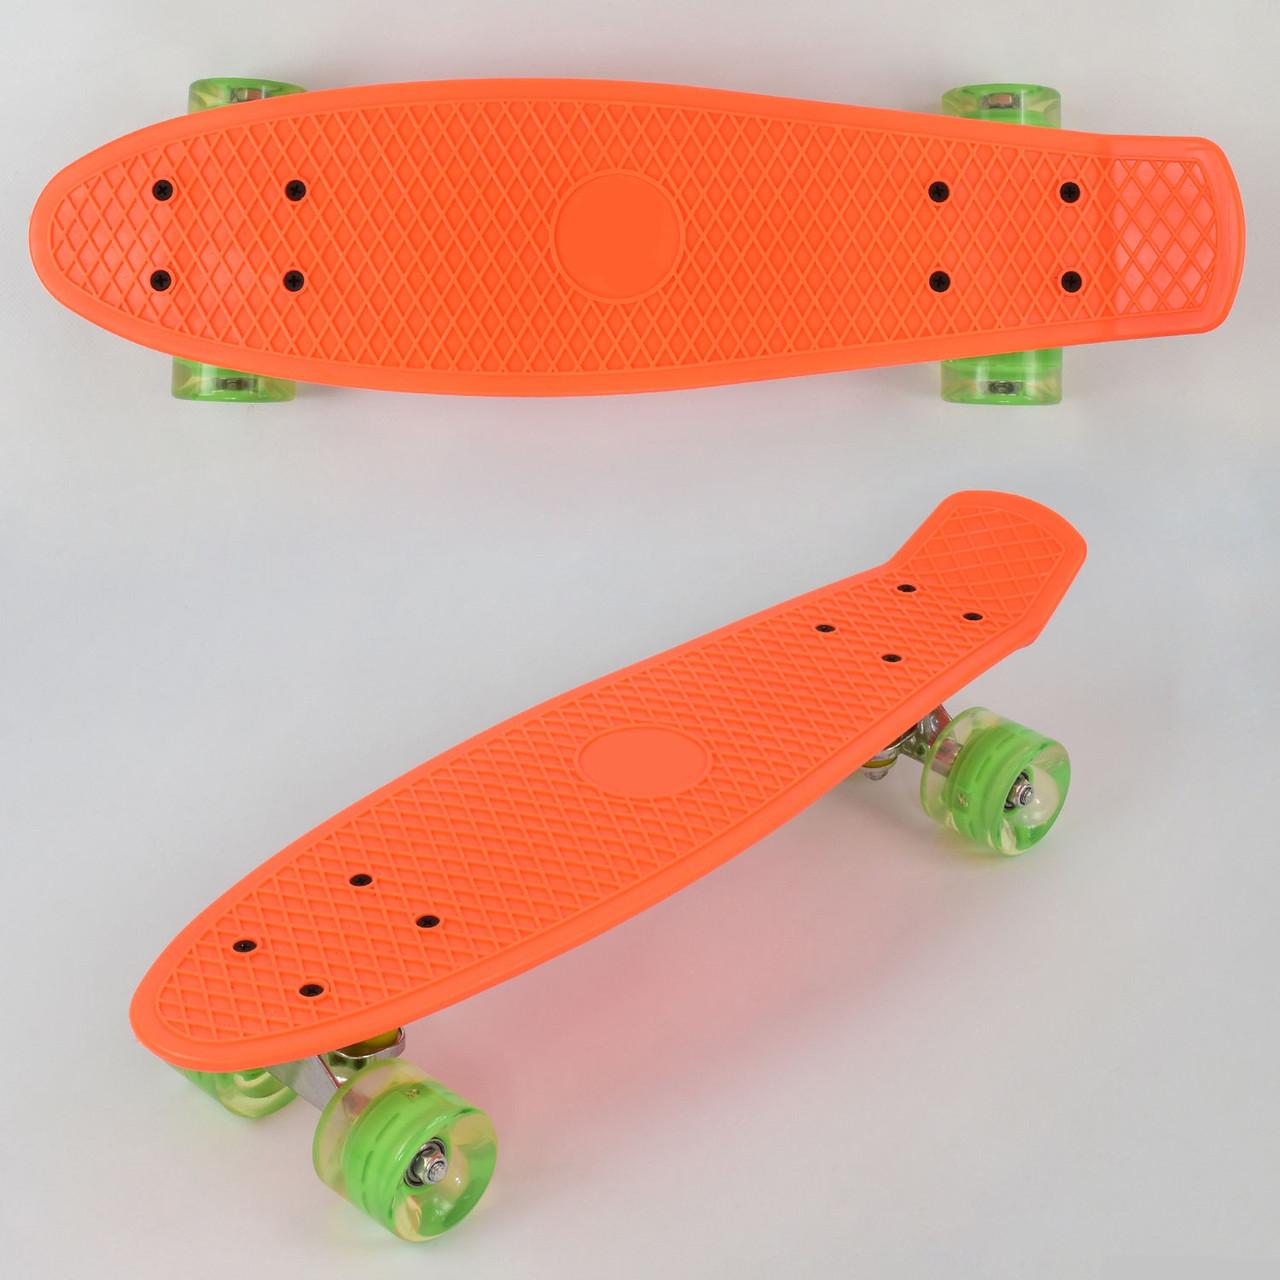 Скейт Пенни Борд (Penny Board) со светящими колесами. 22 дюйма. Оранжевый